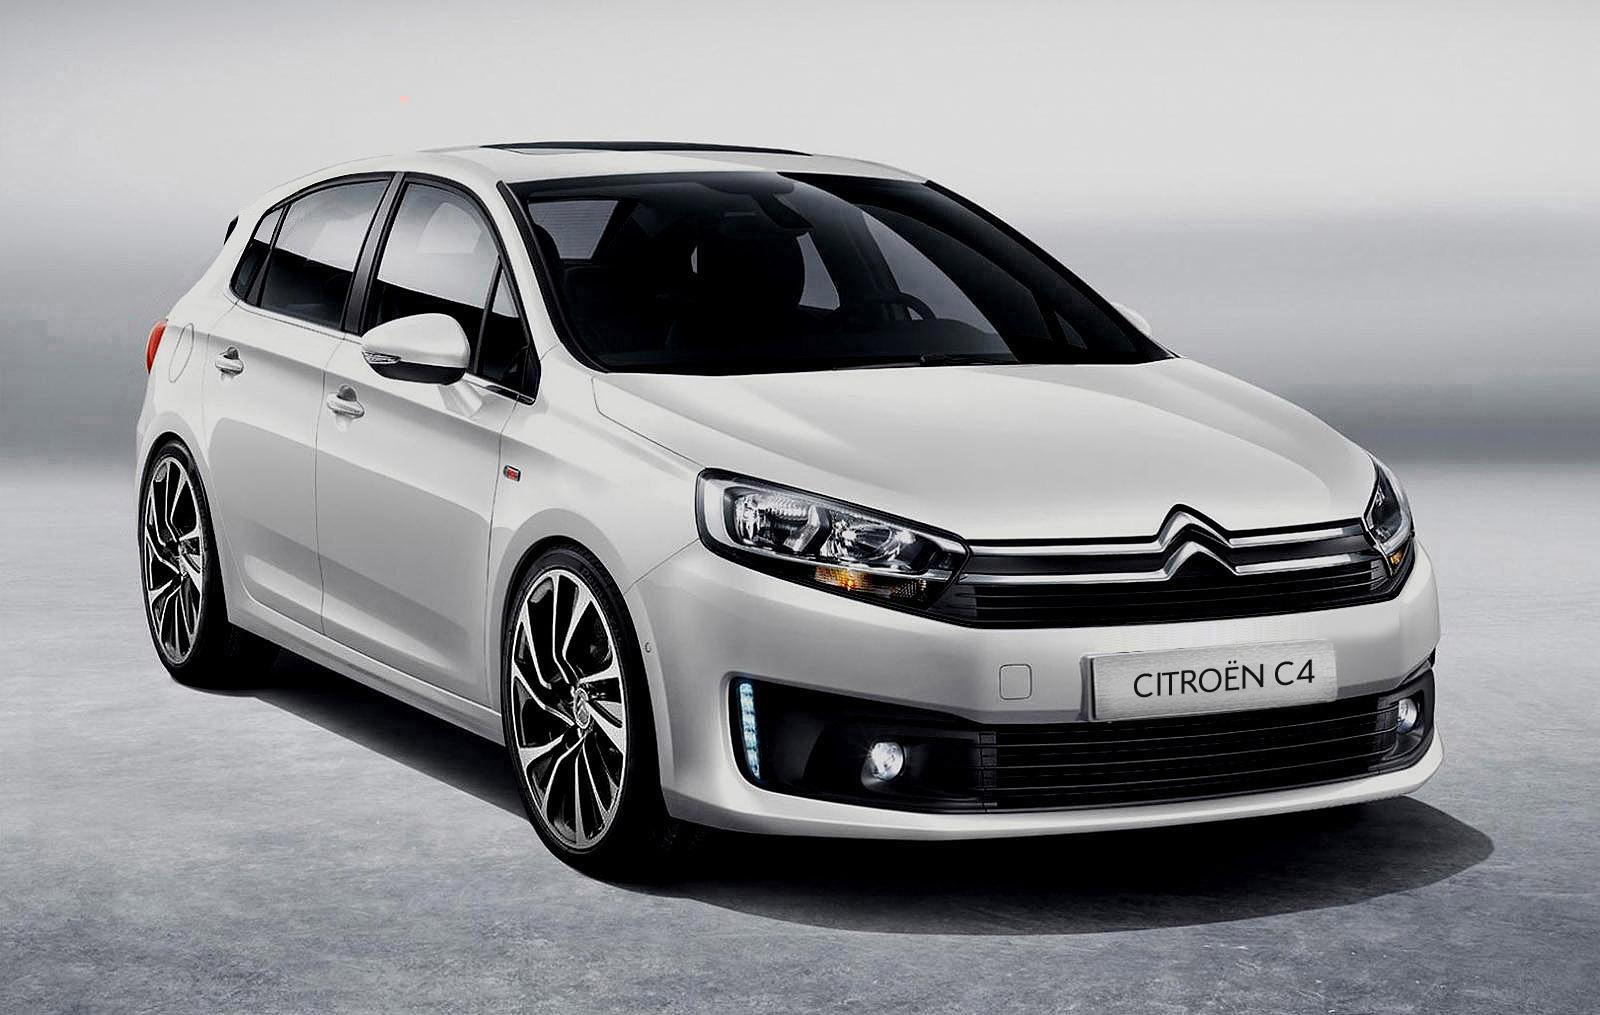 2017 - [FUTUR MODÈLE] Citroën C4 III [F3] - Page 2 Citroe10